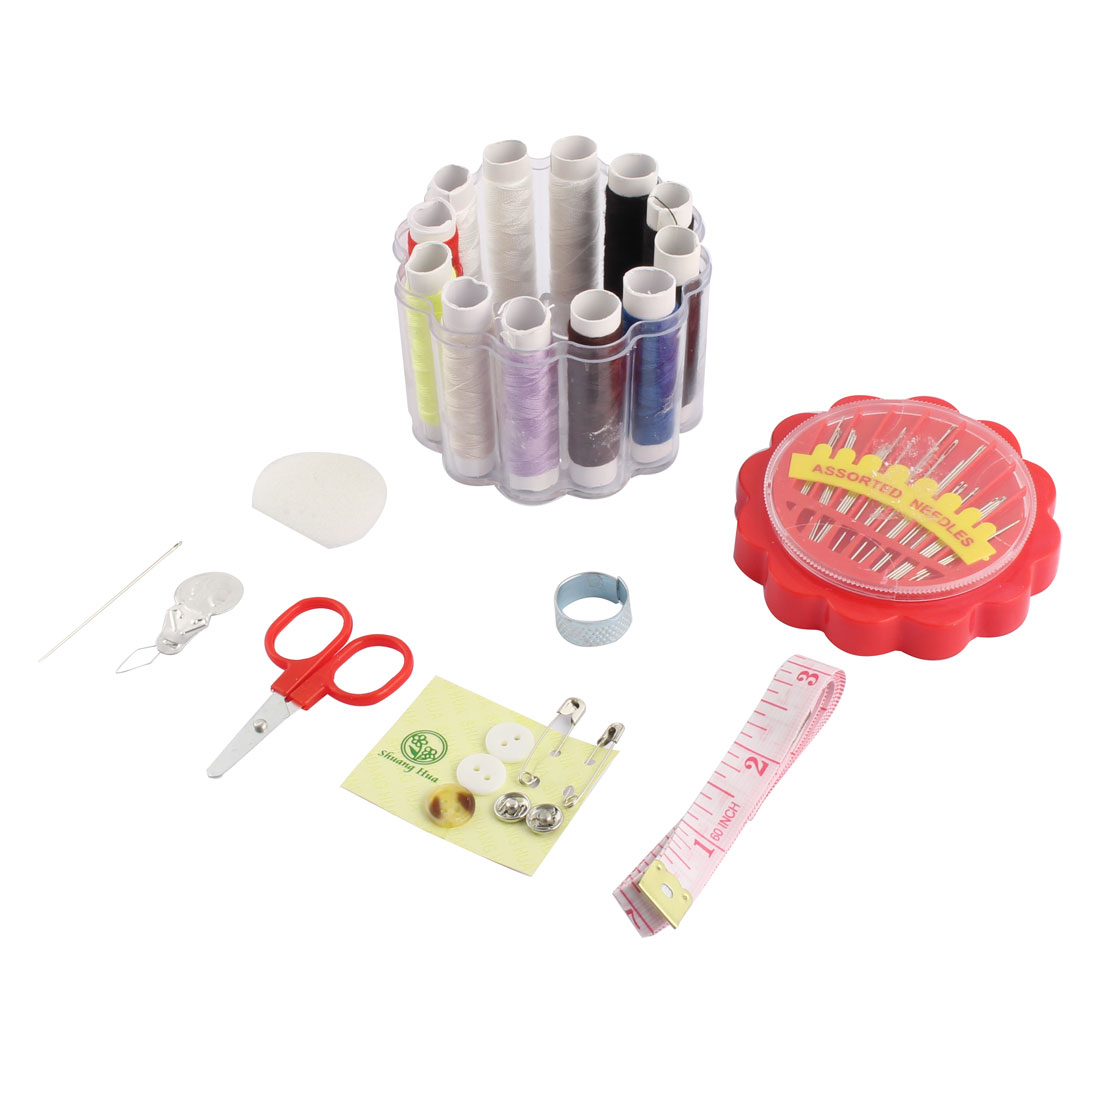 Plastic Box Measure Tape Needle Thread Scissors Thimble Sewing Tool Kit Red